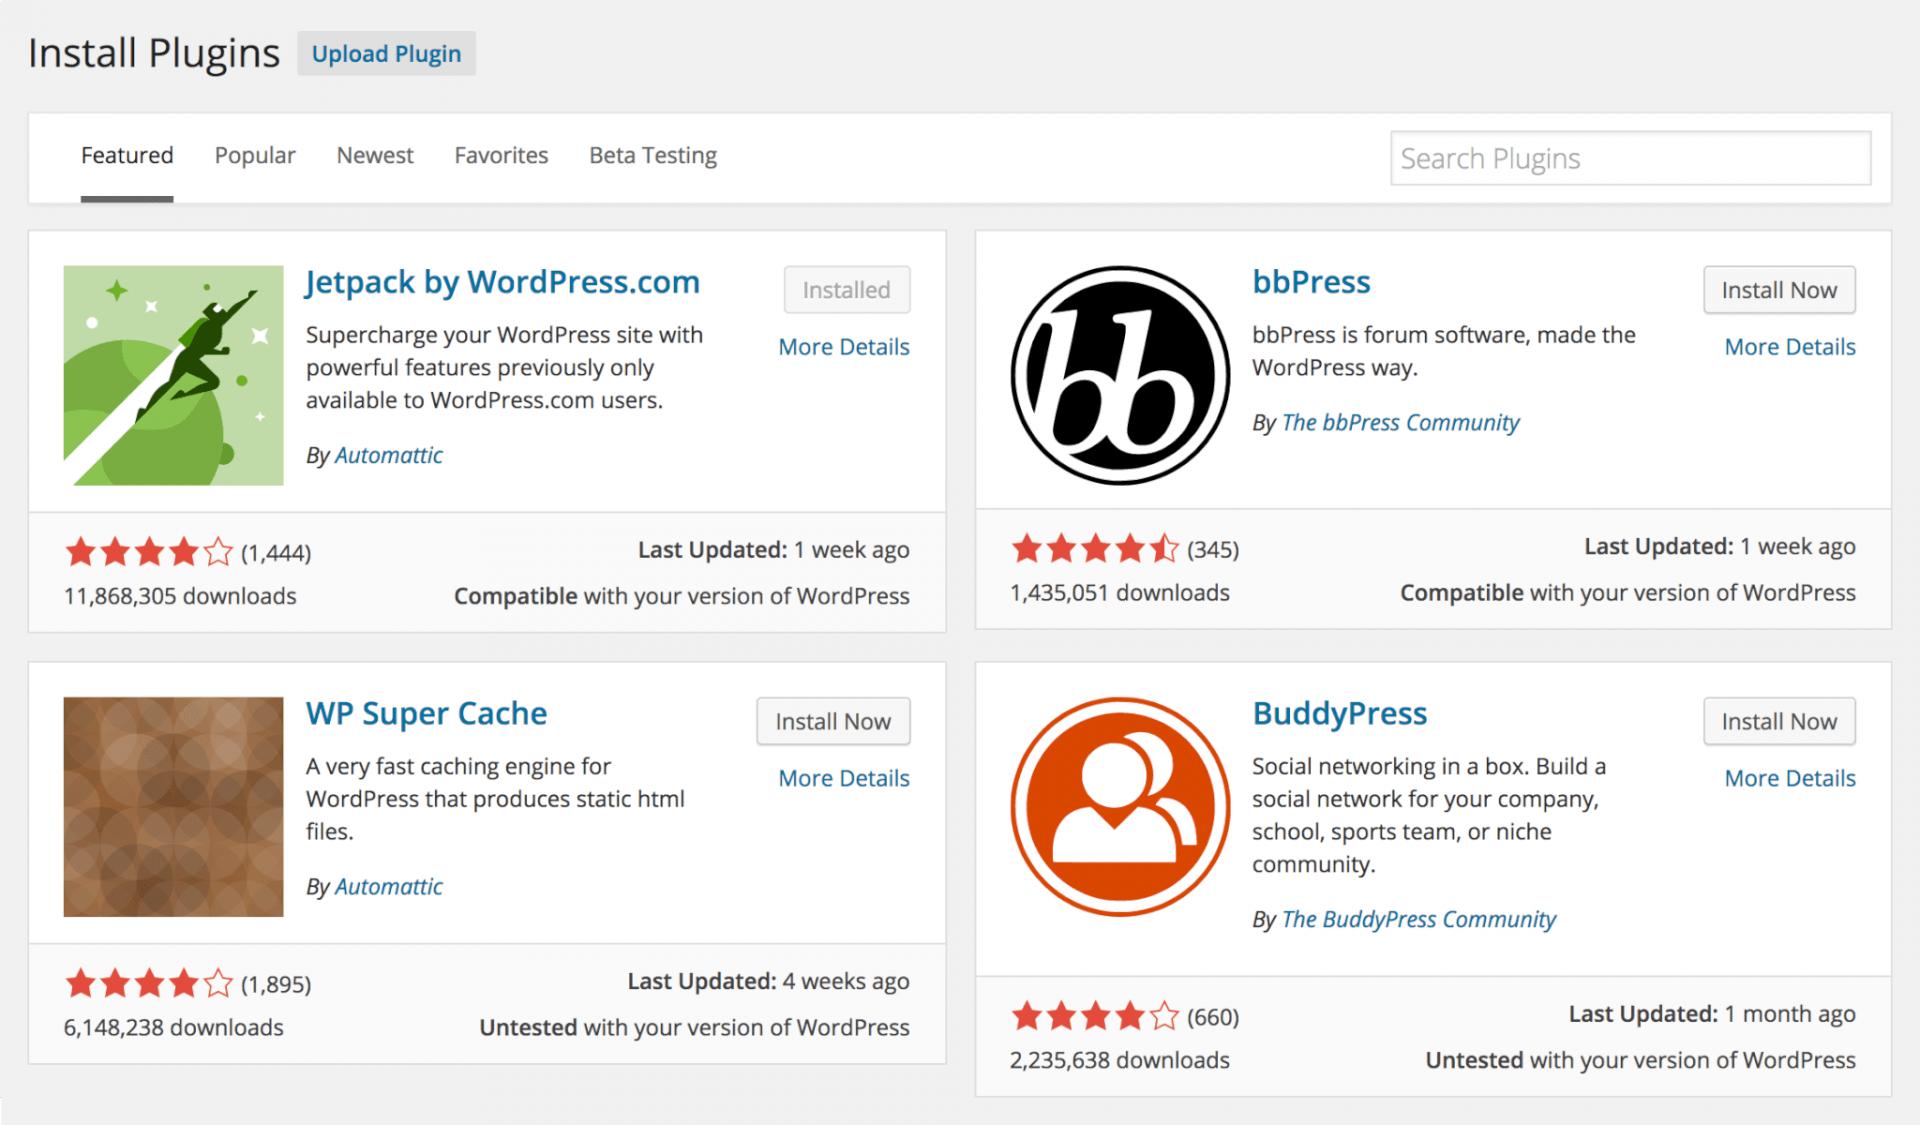 WordPress 4.0 Plugin Installer